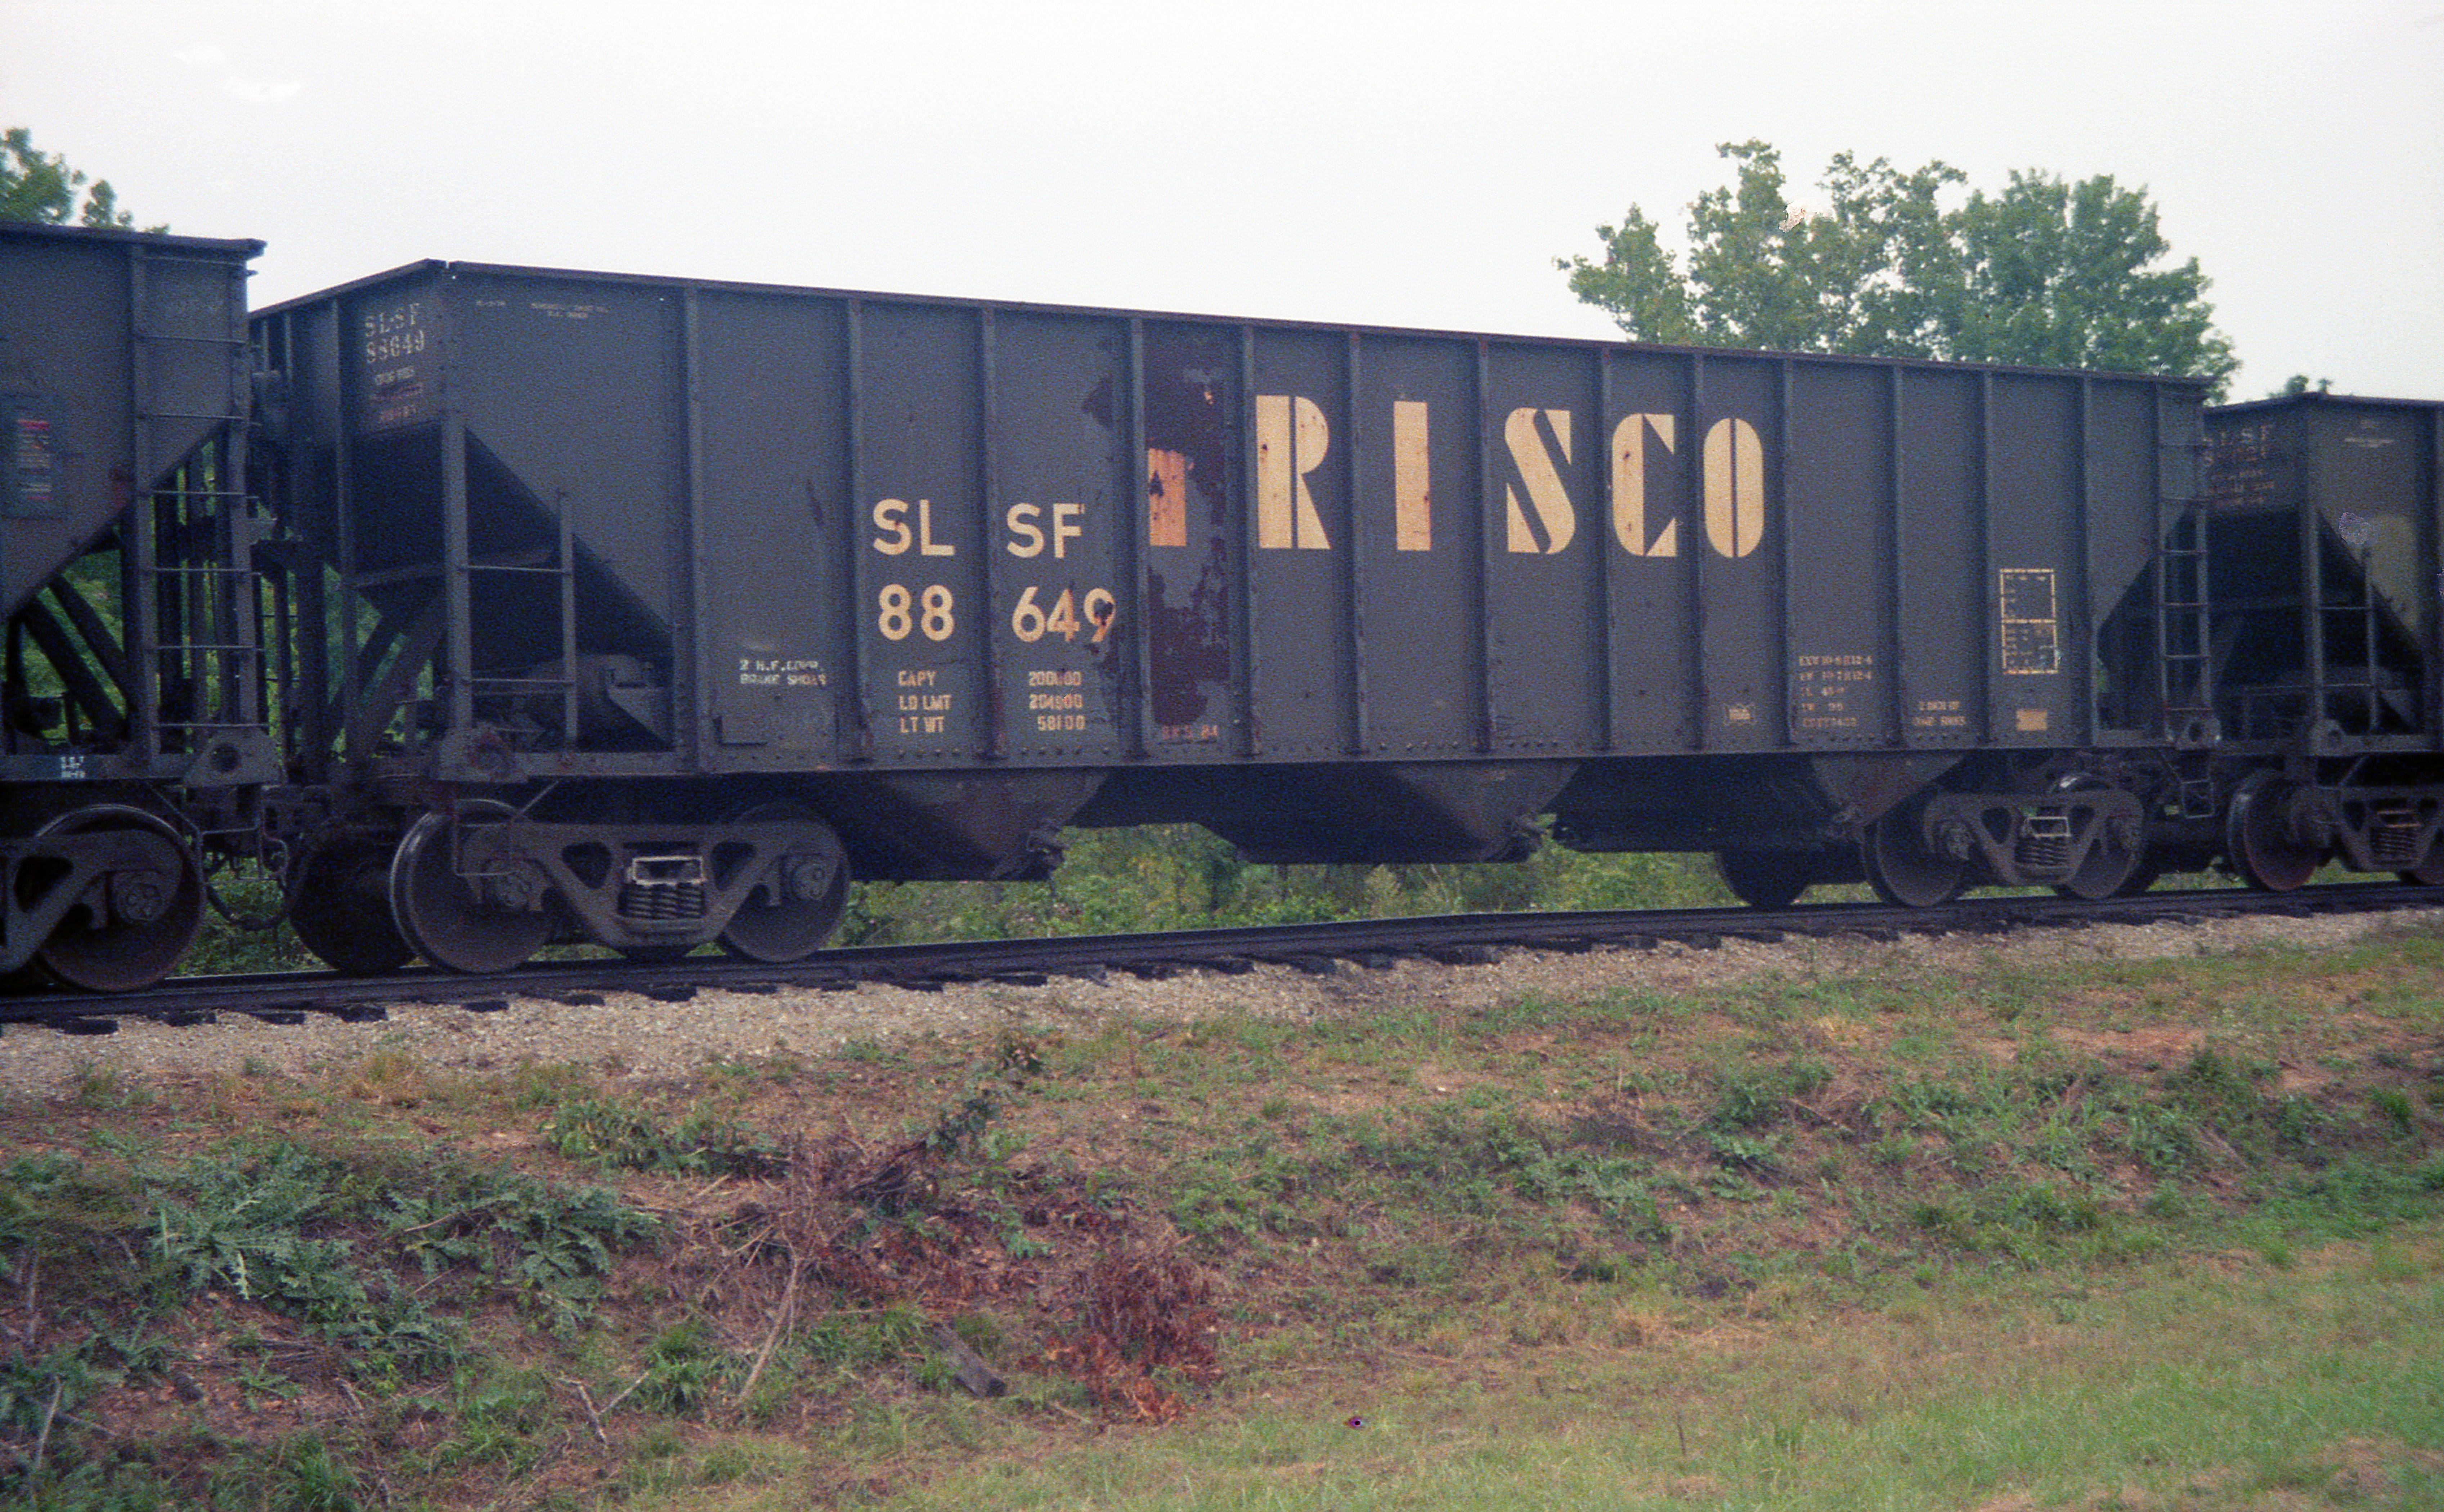 Hopper 88649 at Kissick, Missouri in September 1987 (R.R. Taylor)